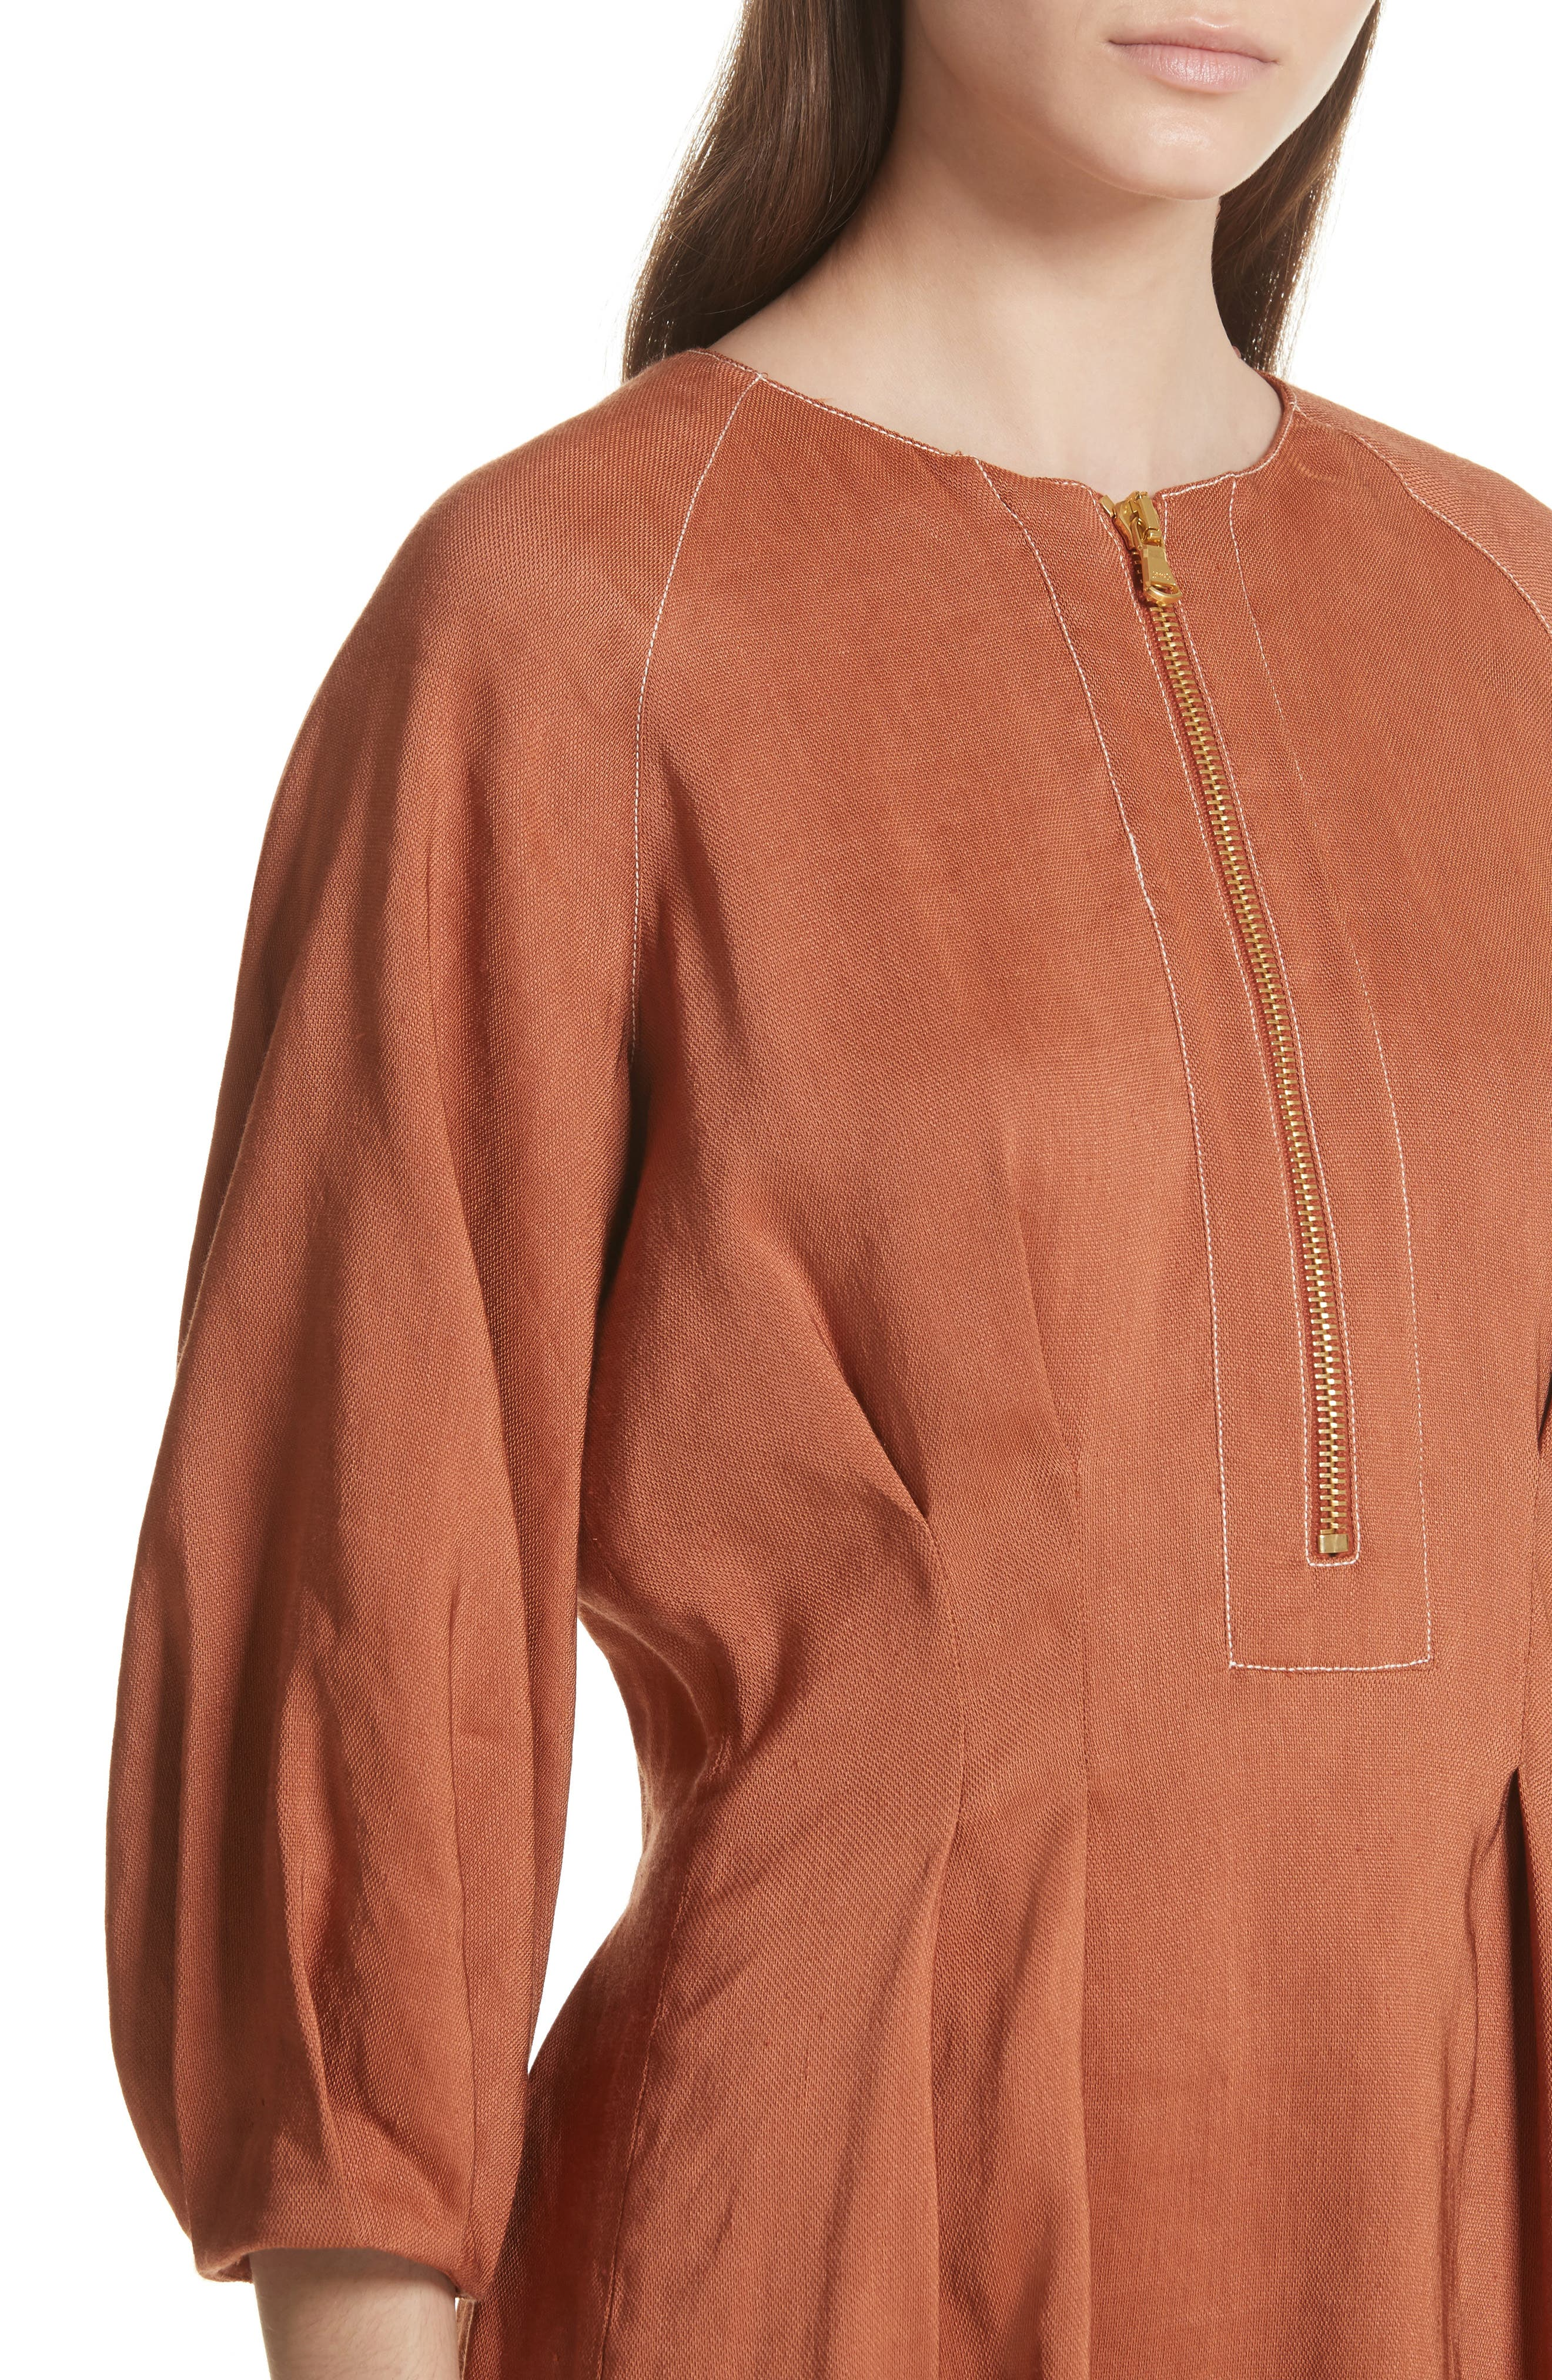 Claudia Linen Blend Midi Dress,                             Alternate thumbnail 4, color,                             821